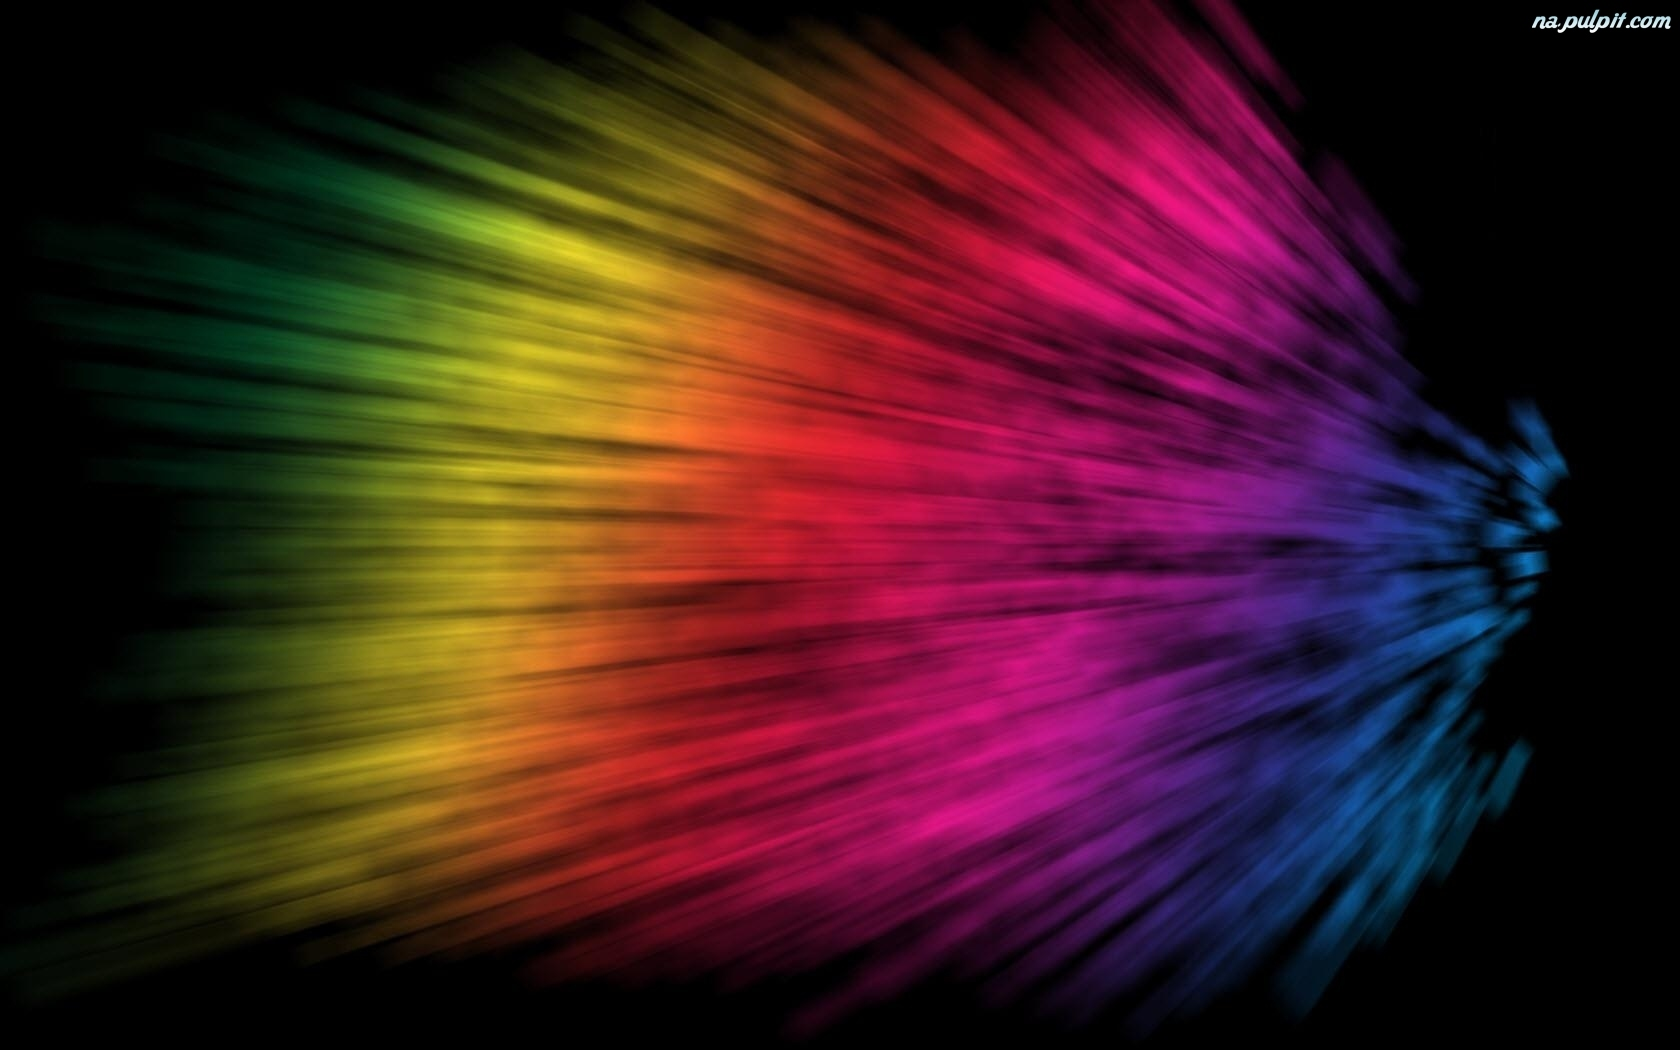 Colorful Hd Iphone Wallpapers Tęcza Kolory Tekstura Na Pulpit